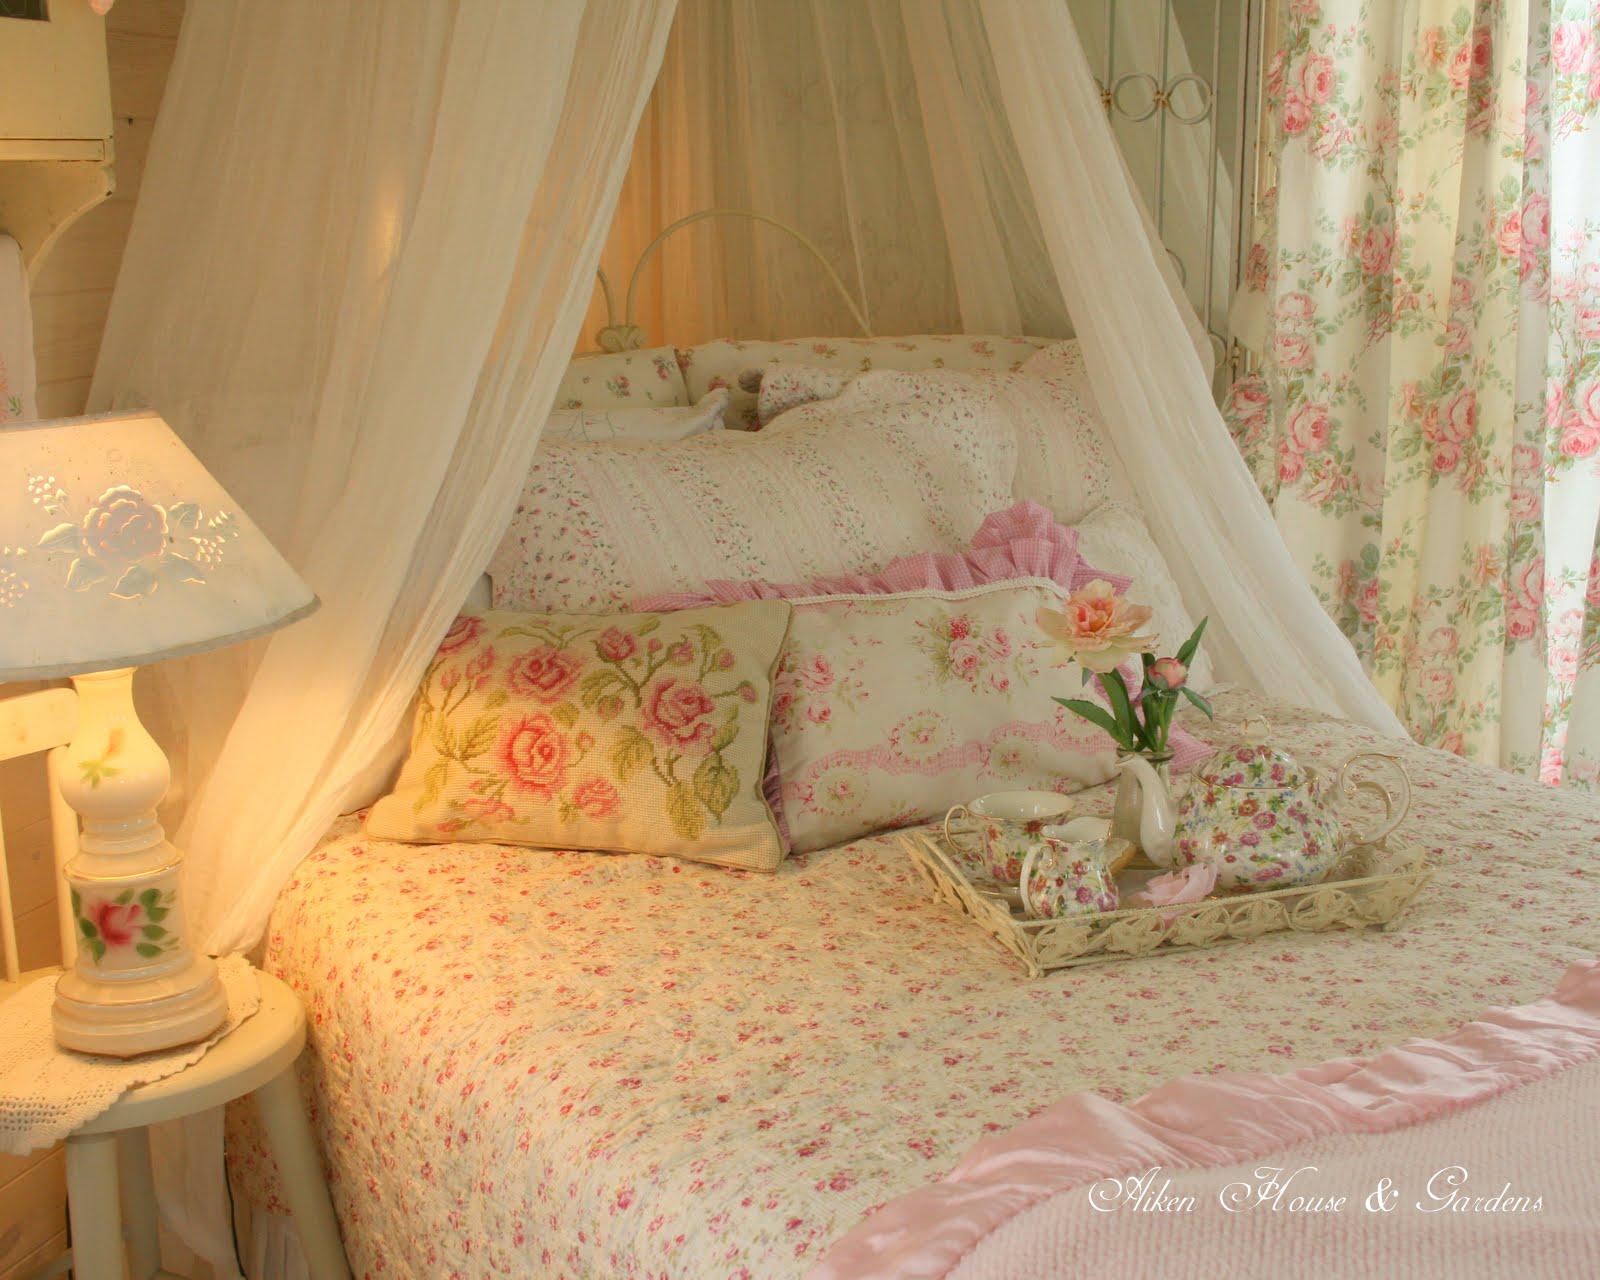 aiken house gardens sunday morning breakfast in bed. Black Bedroom Furniture Sets. Home Design Ideas